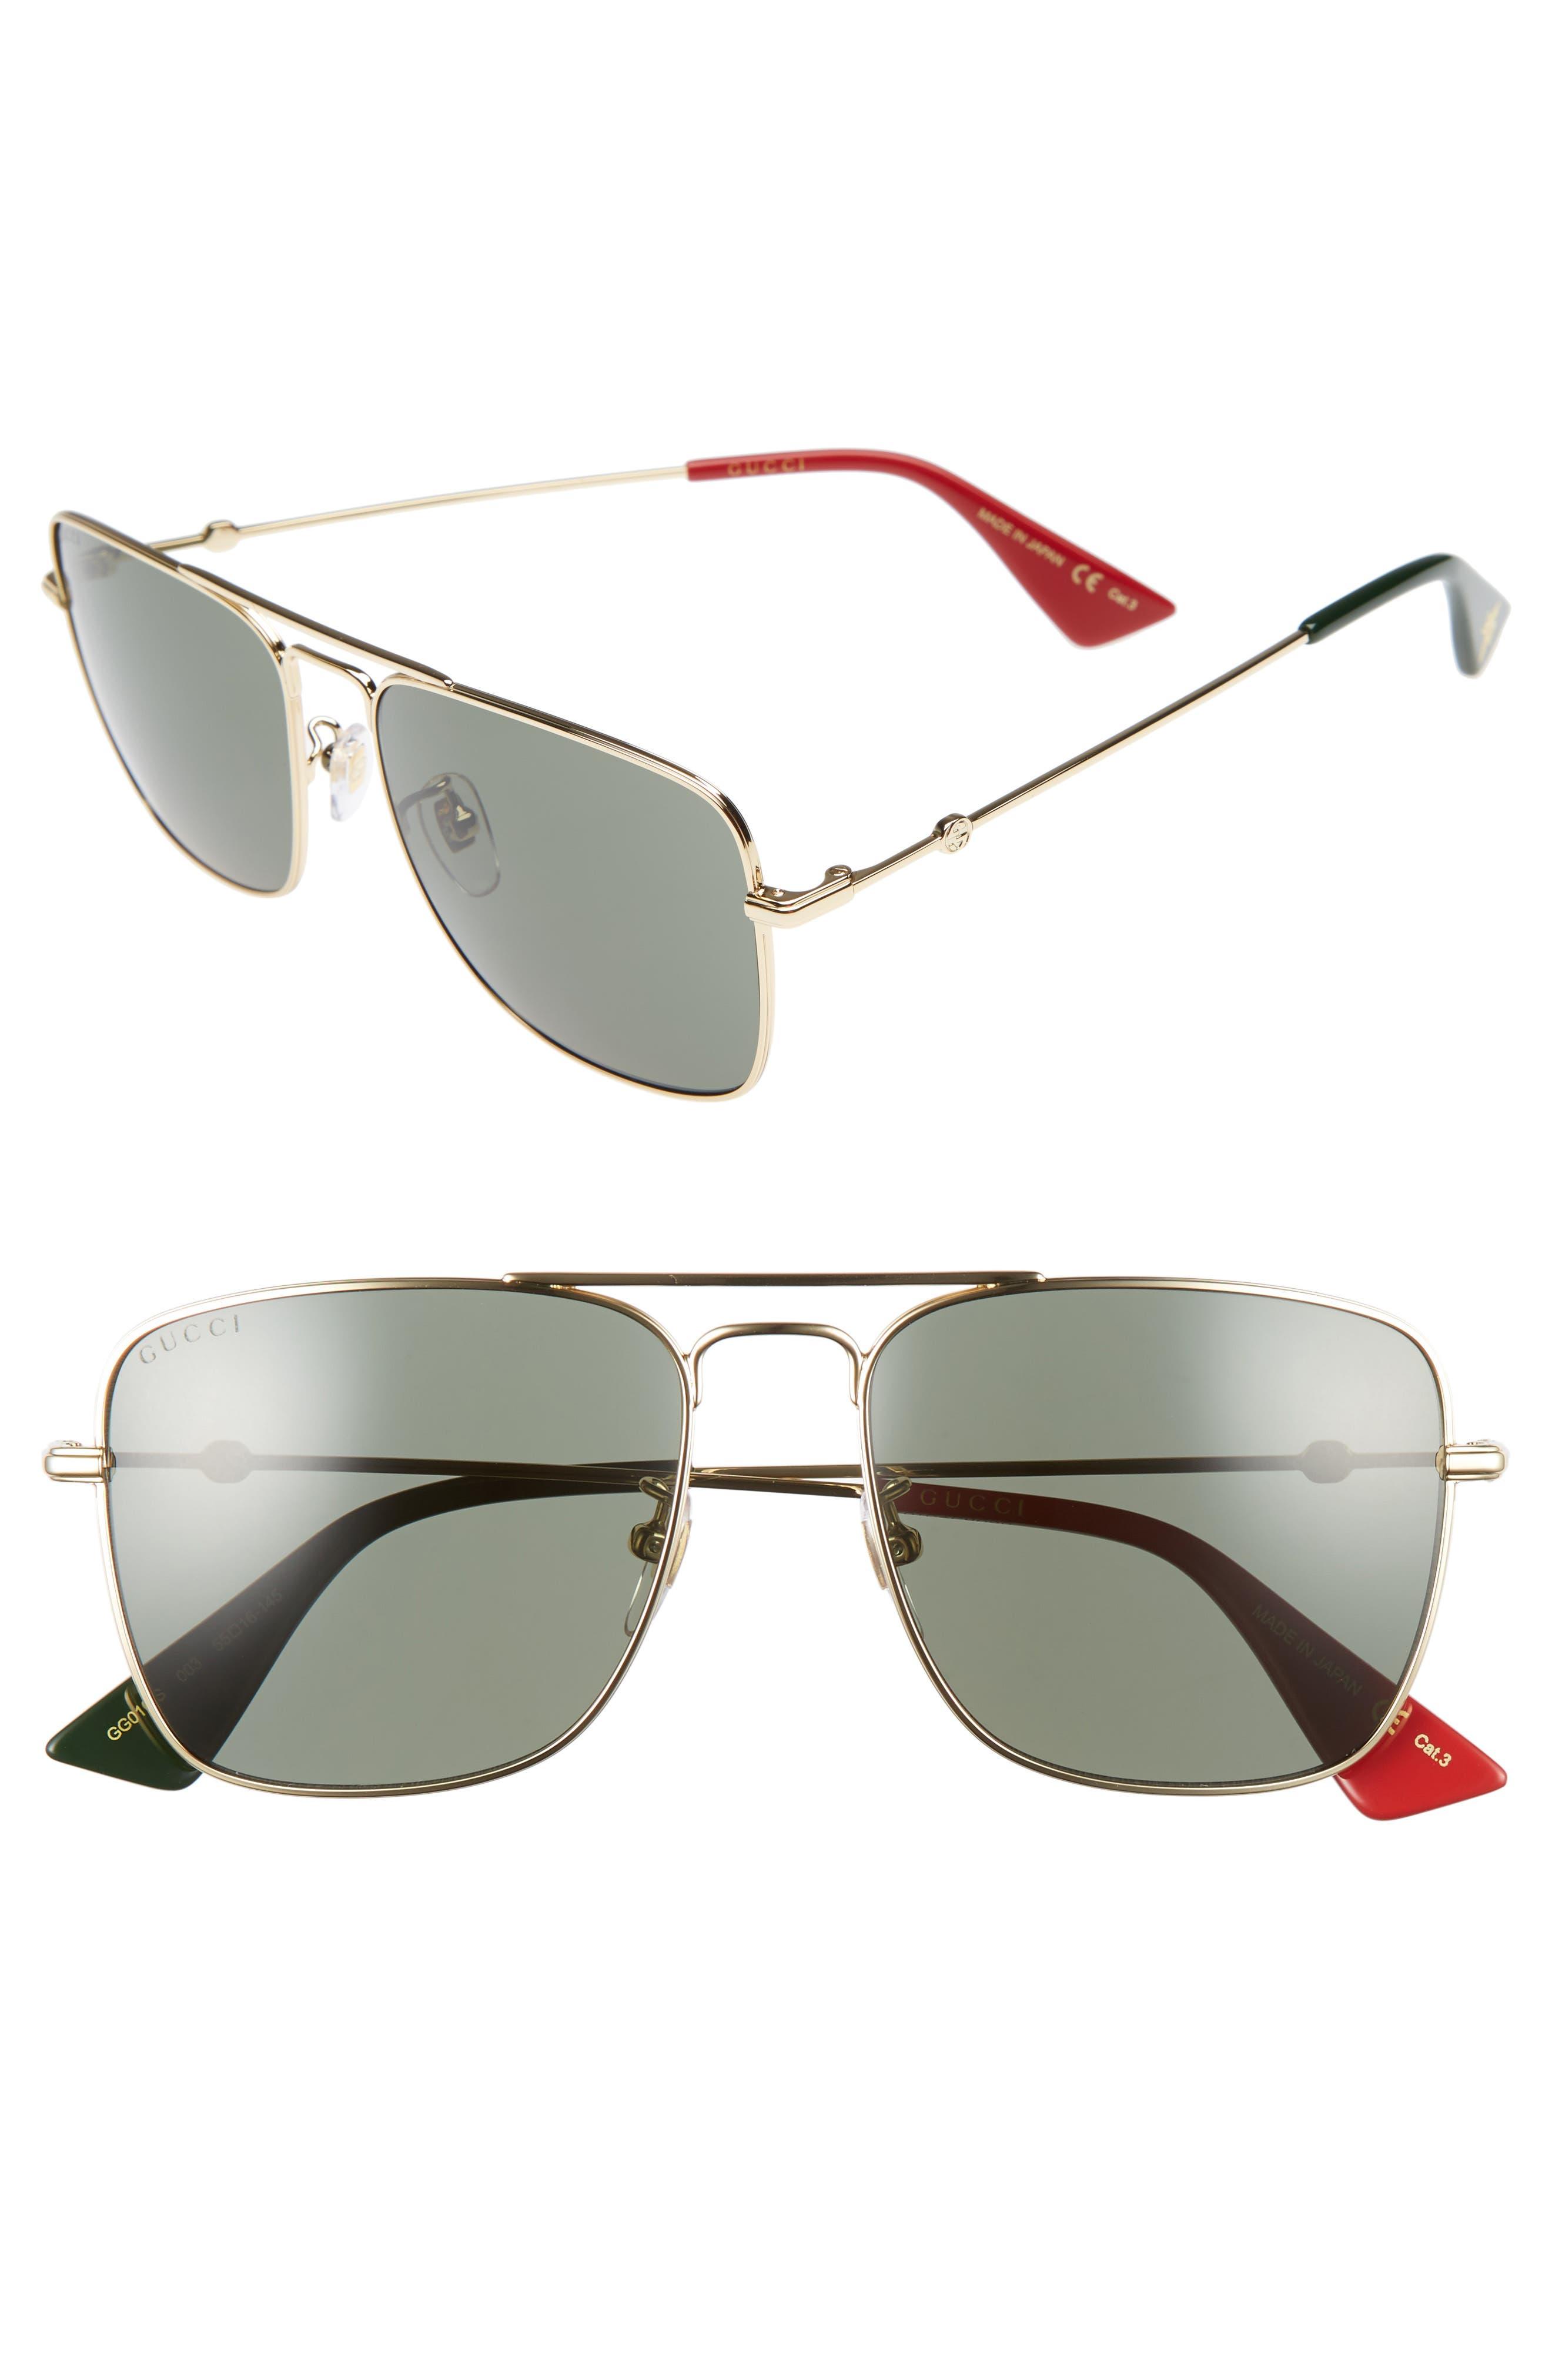 Caravan 55mm Square Aviator Sunglasses,                         Main,                         color, Gold/ Green